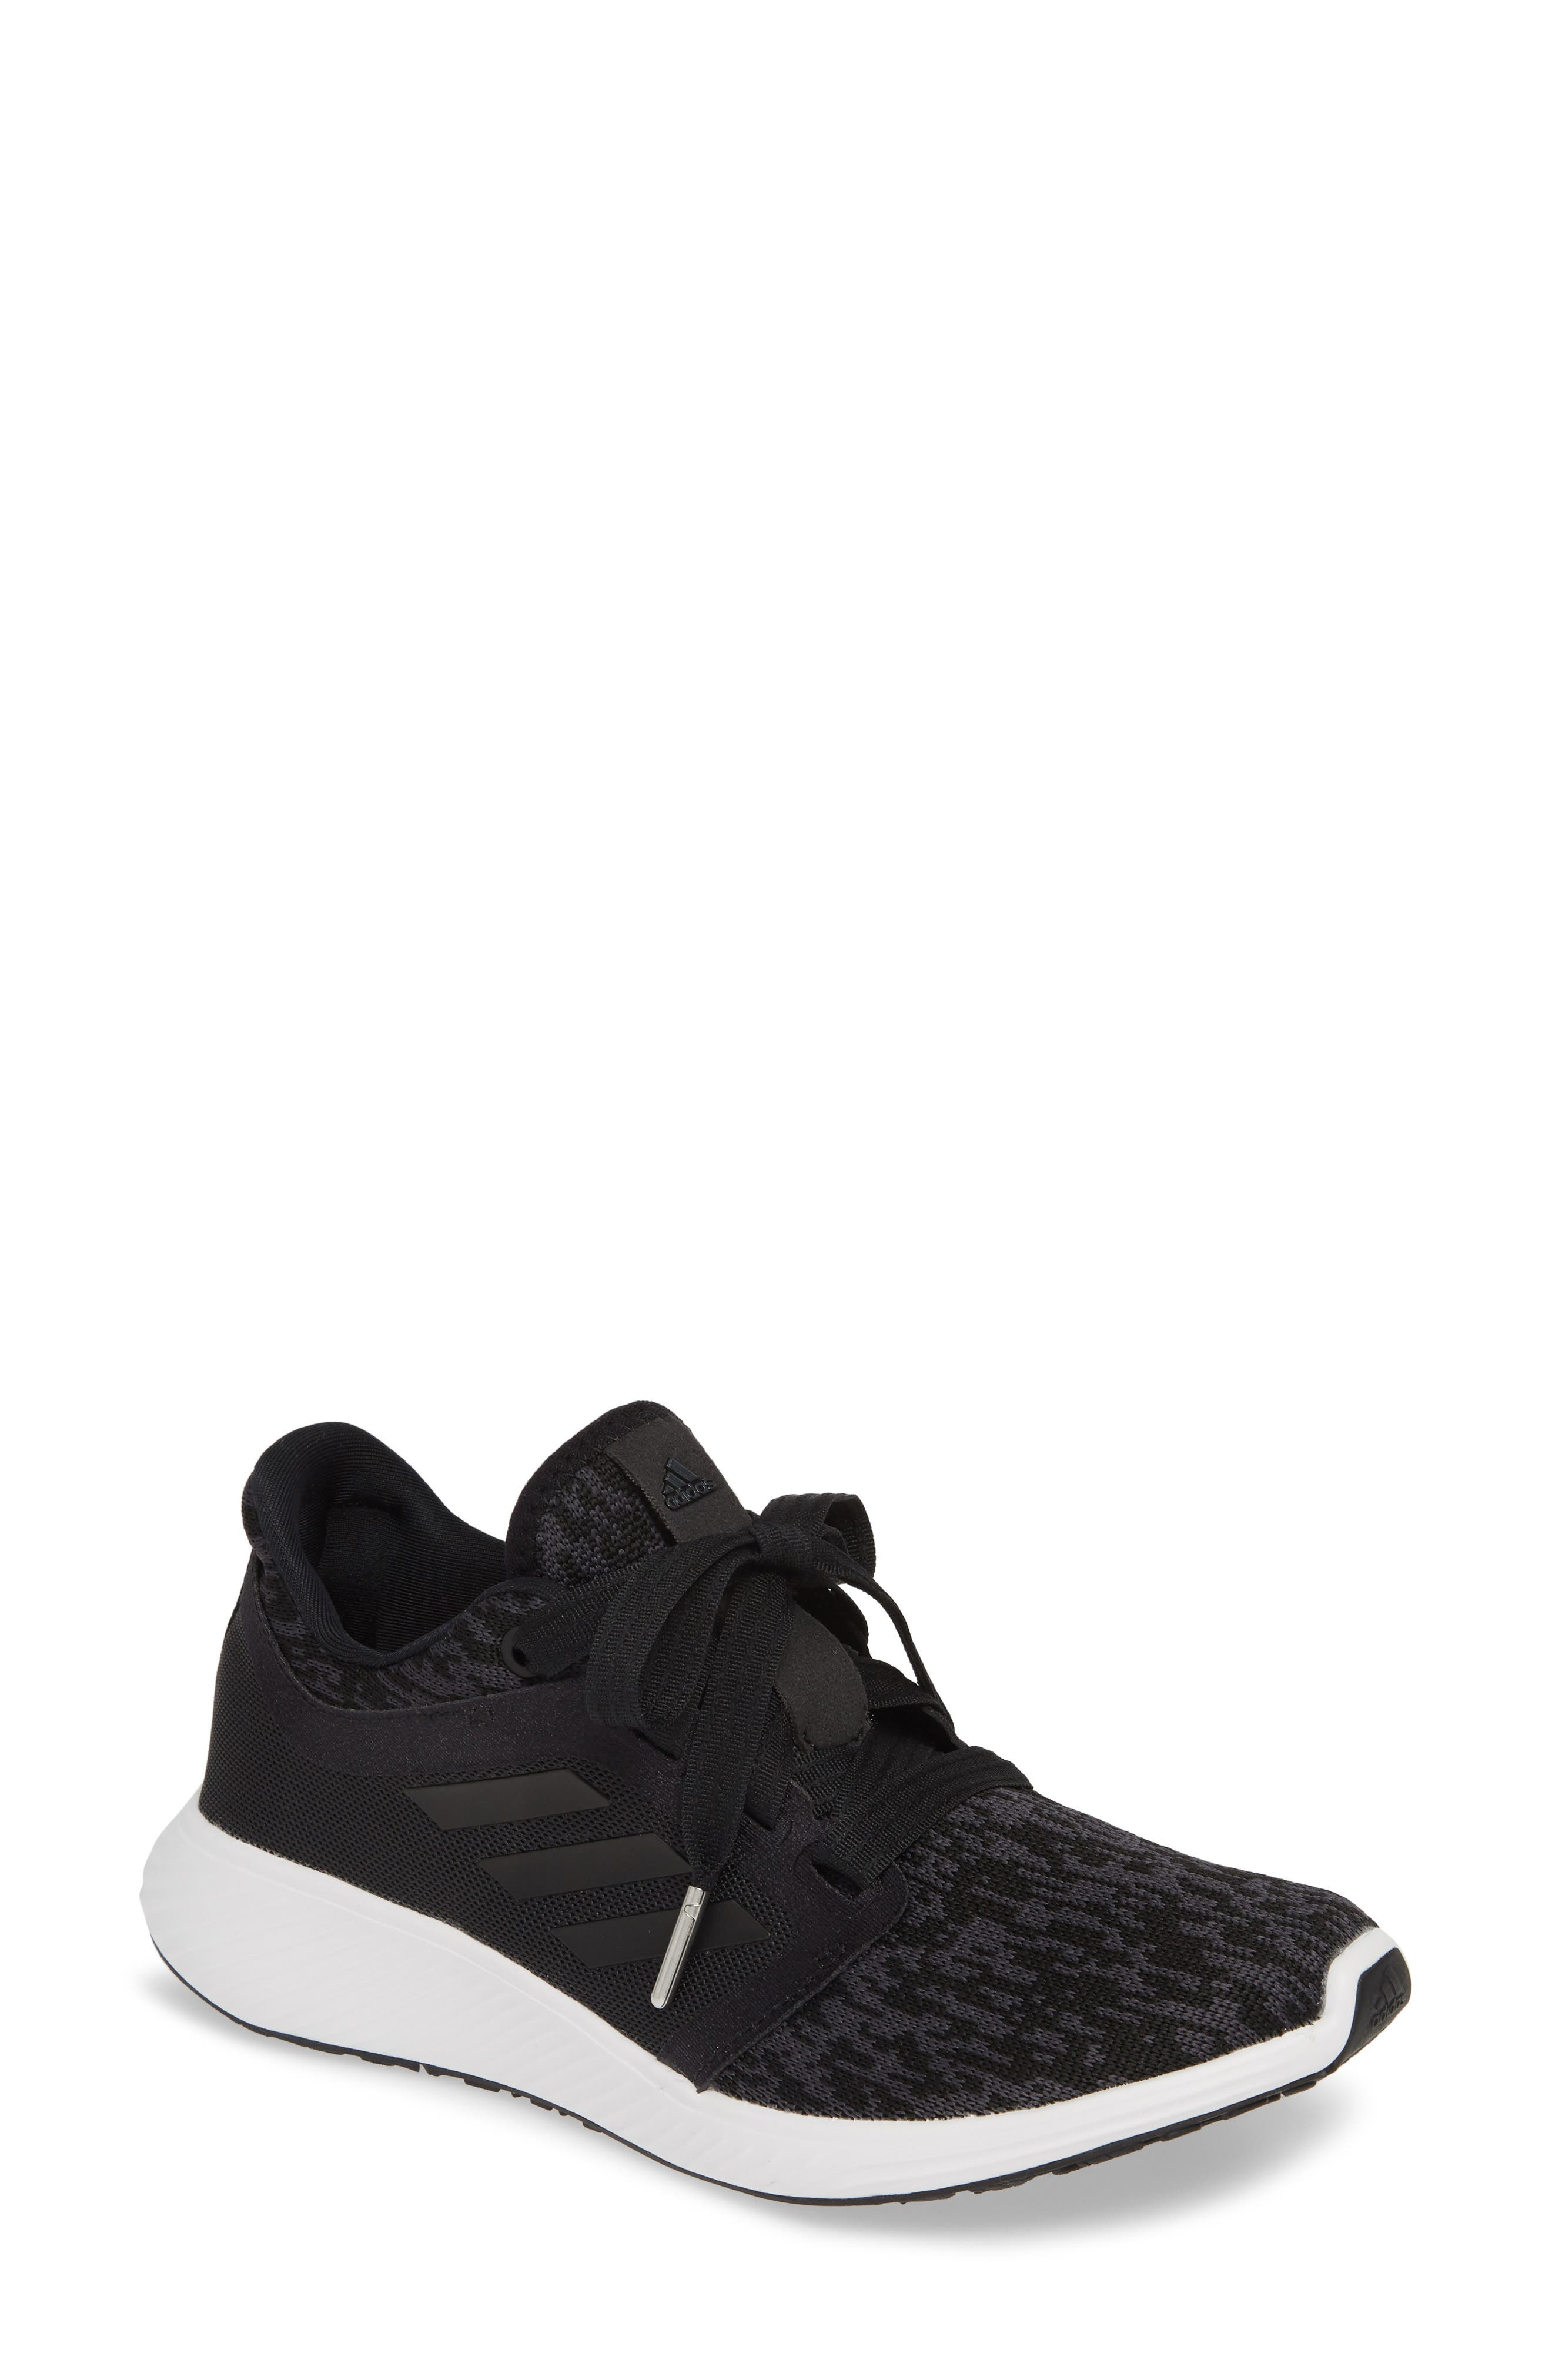 ADIDAS Edge Lux 3 Running Shoe, Main, color, CORE BLACK/ WHITE